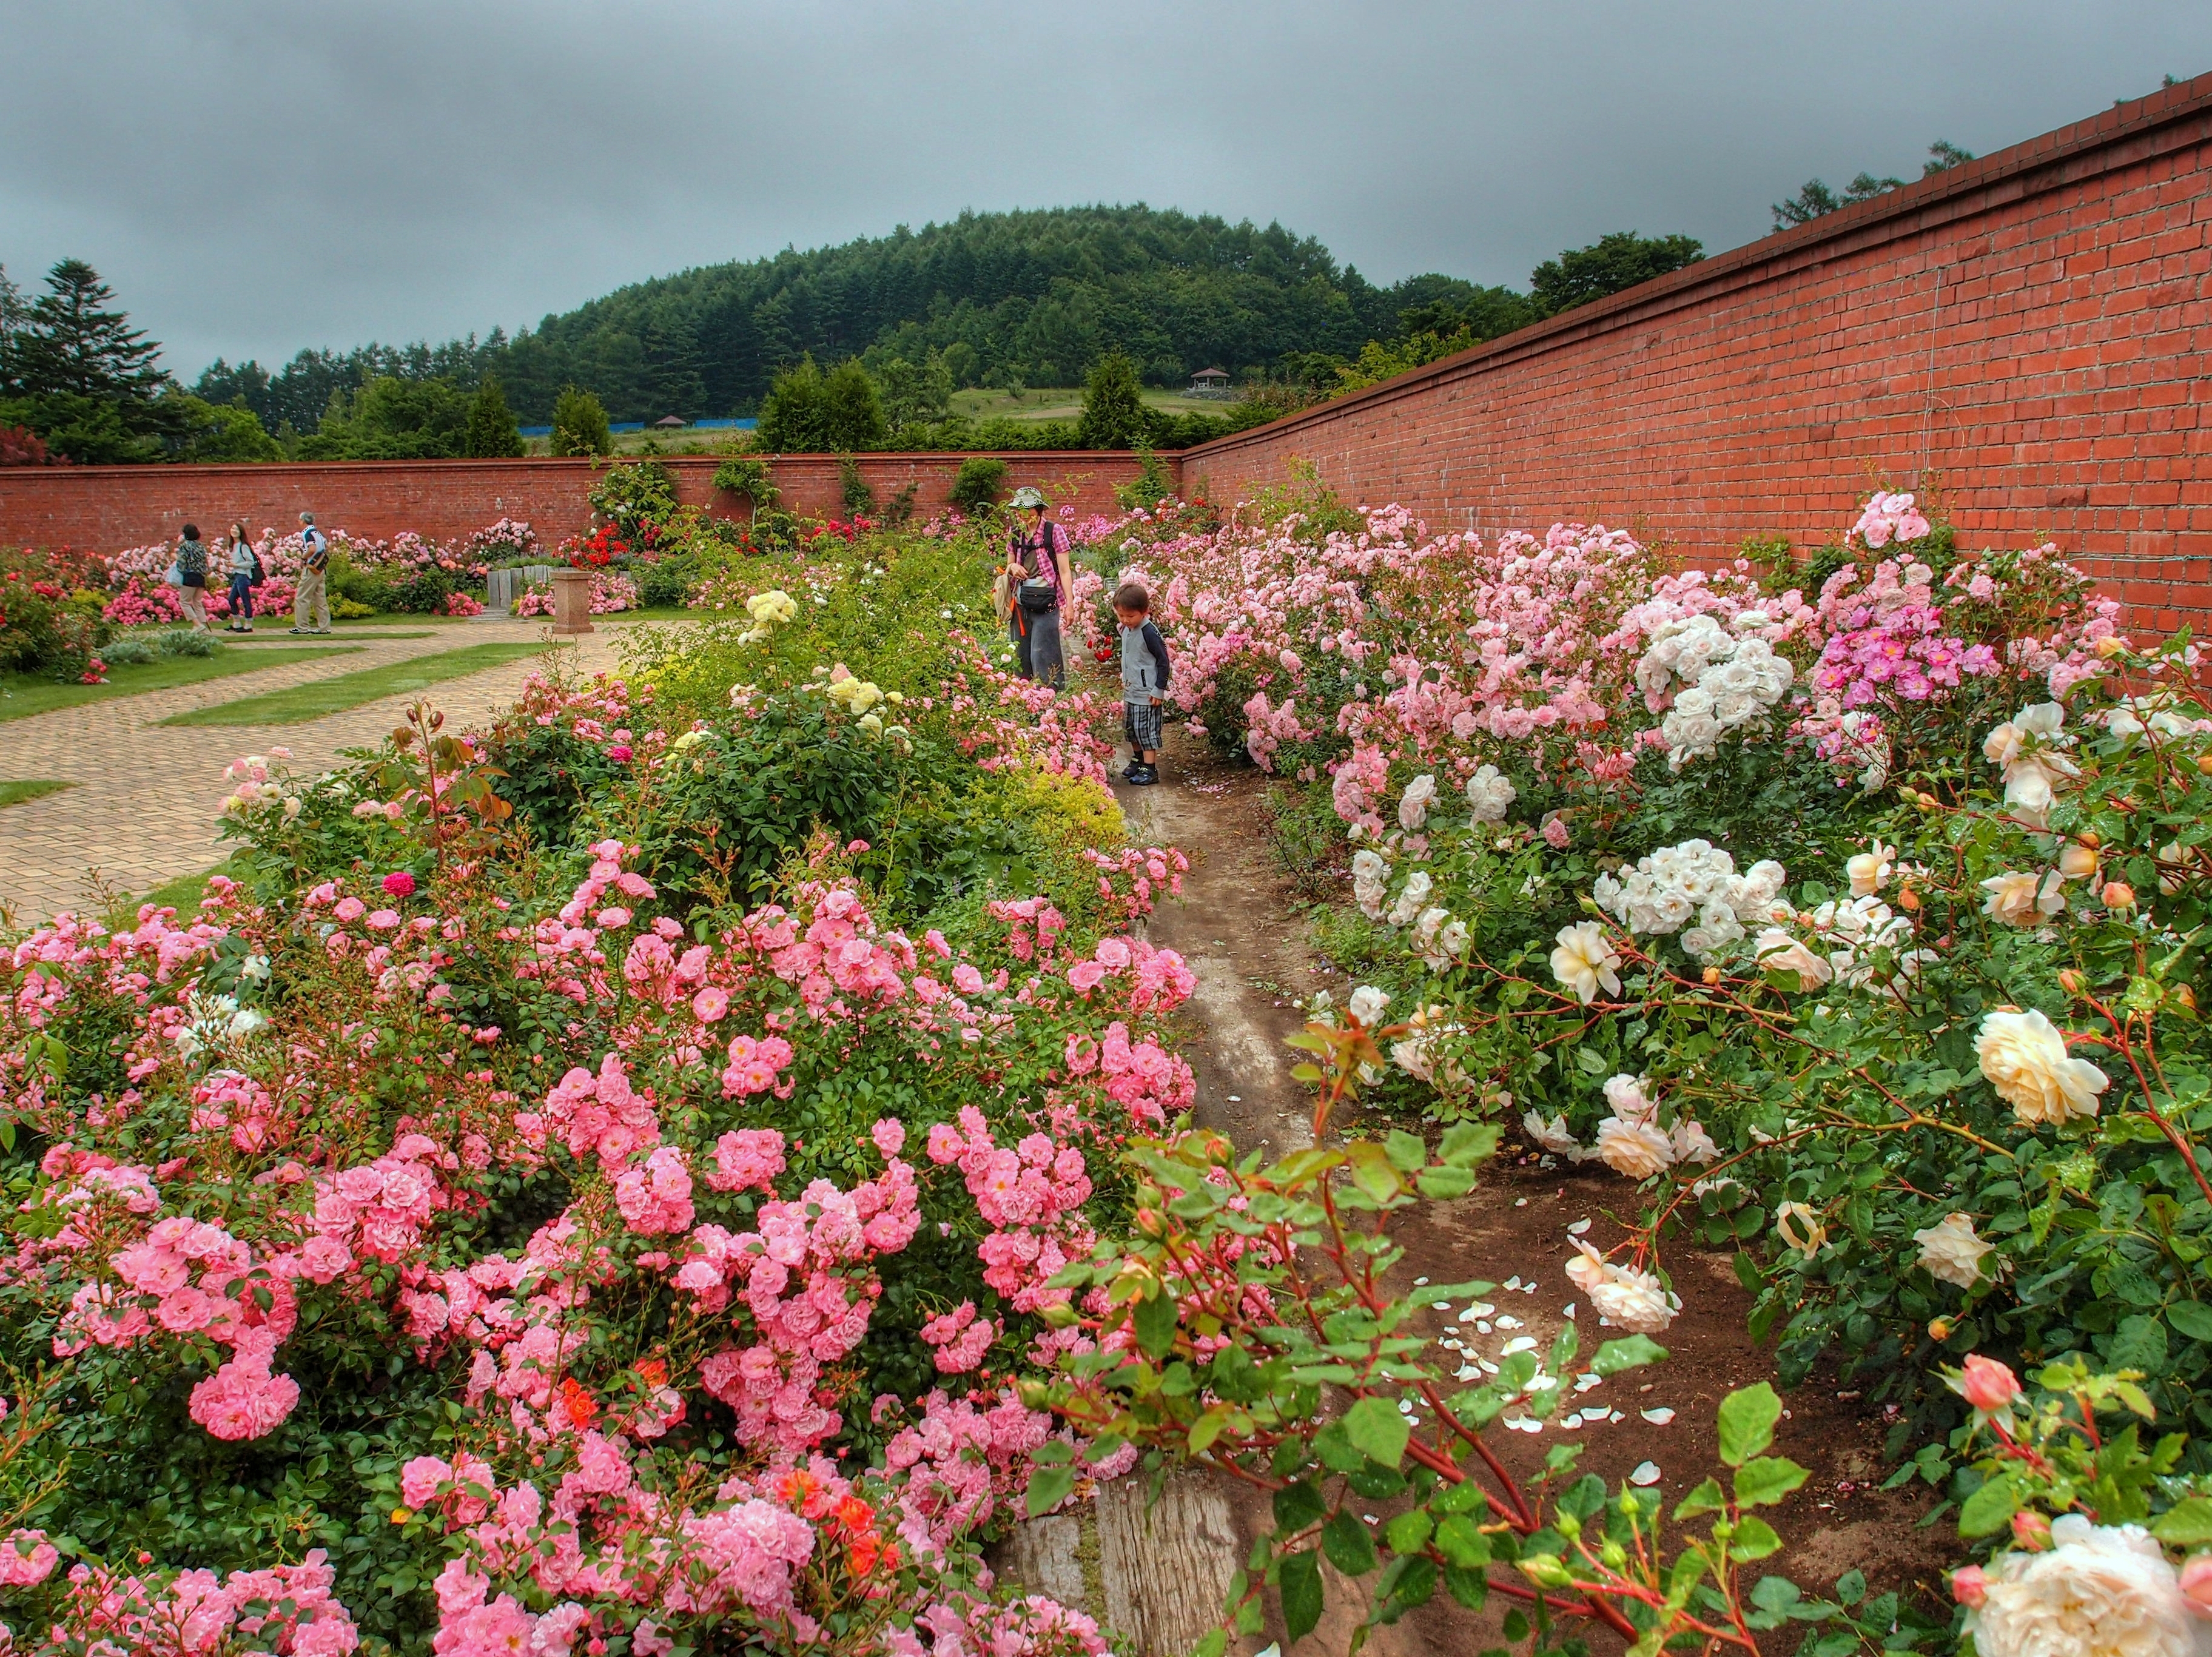 File:ゆにガーデン(Yuni Garden).jpg - Wikimedia Commons